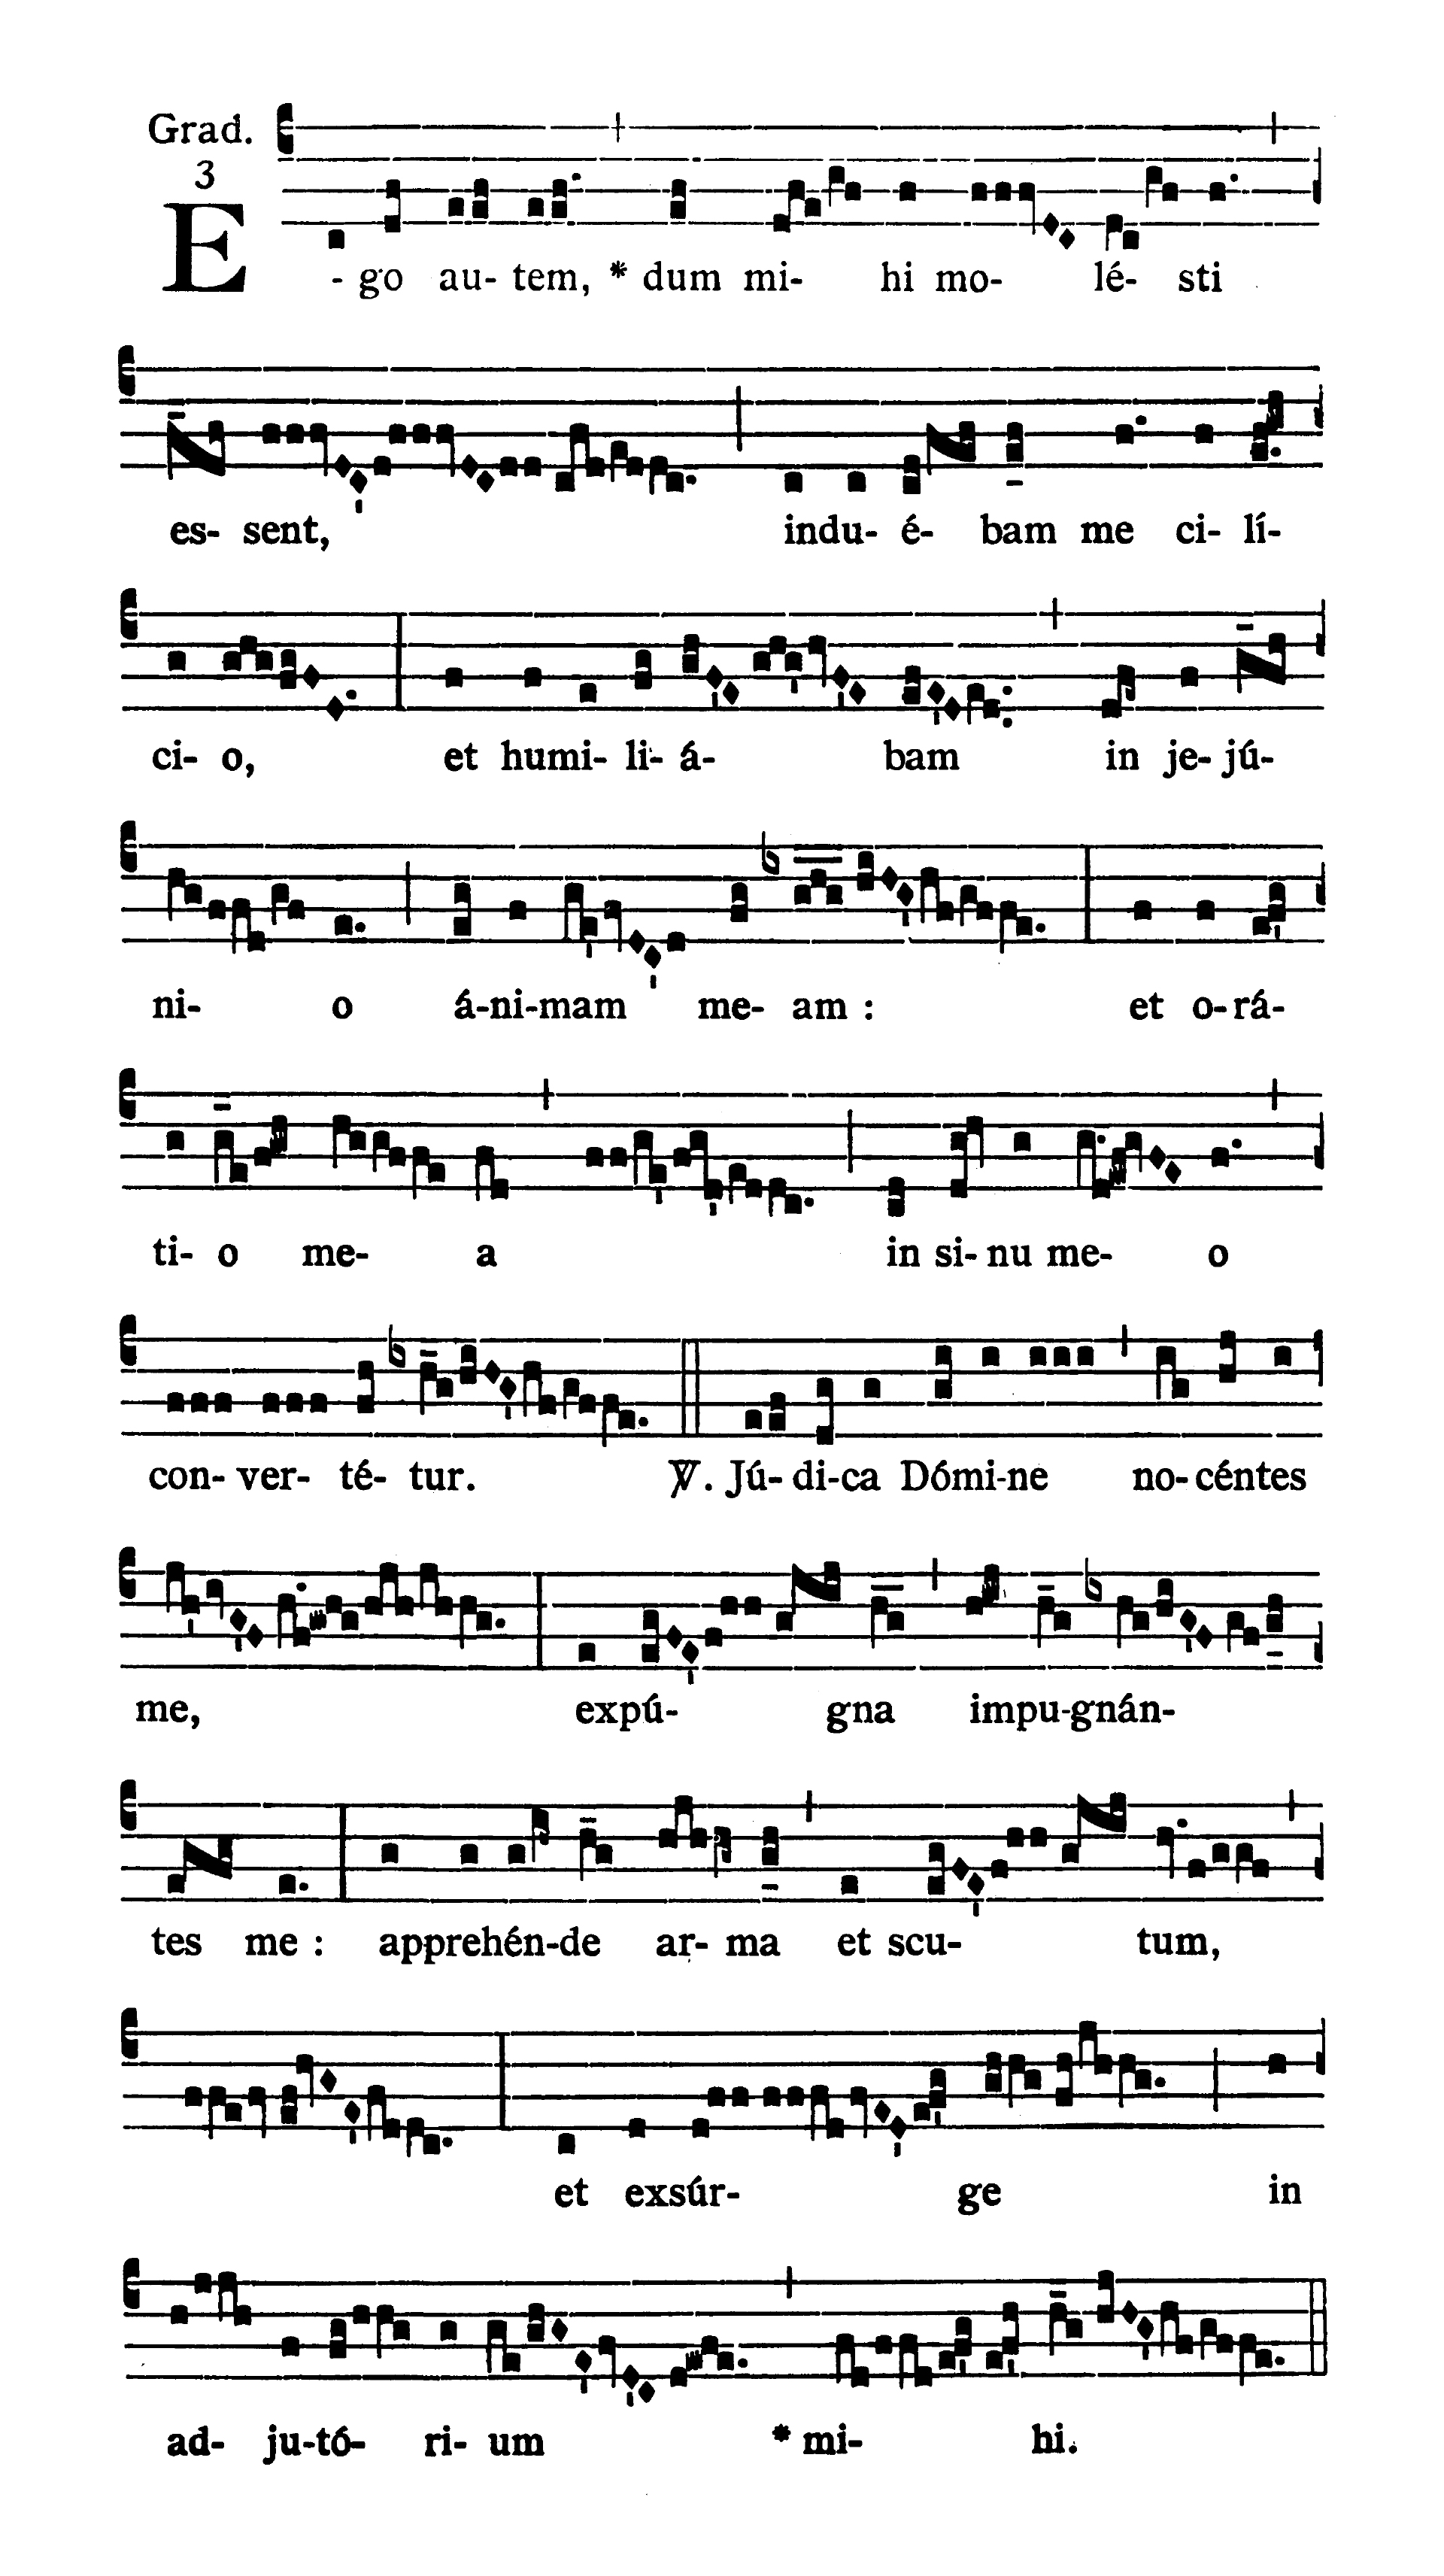 Feria III Hebdomadae Sanctae (Tuesday of Holy Week) - Graduale (Ego autem)